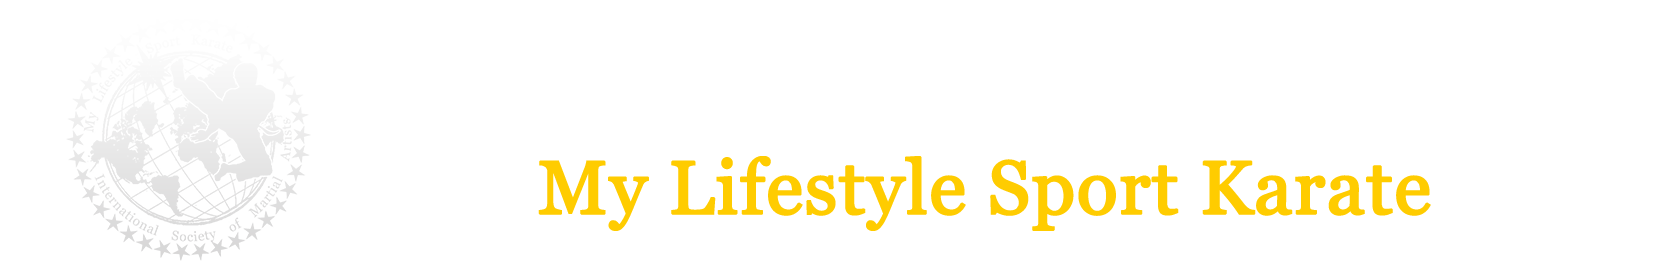 International Society of Martial Artists